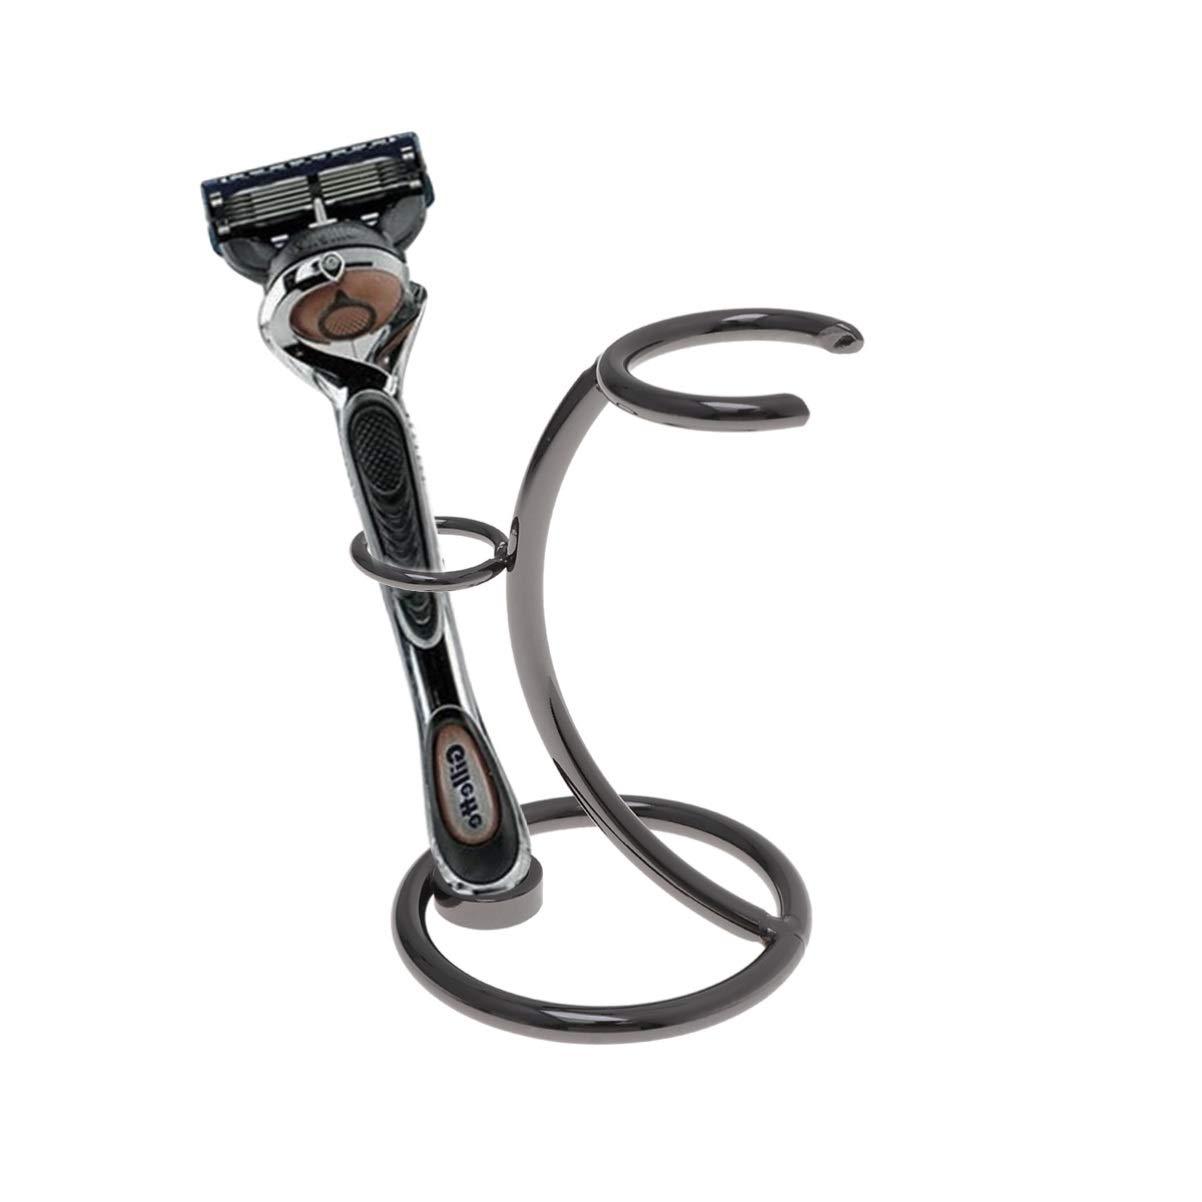 SUPVOX Shaving Razor and Brush Stand Metal Safety Electric Razor Storage Holder Shaver Brush Organizer Rack Gift for Men (Taupe)